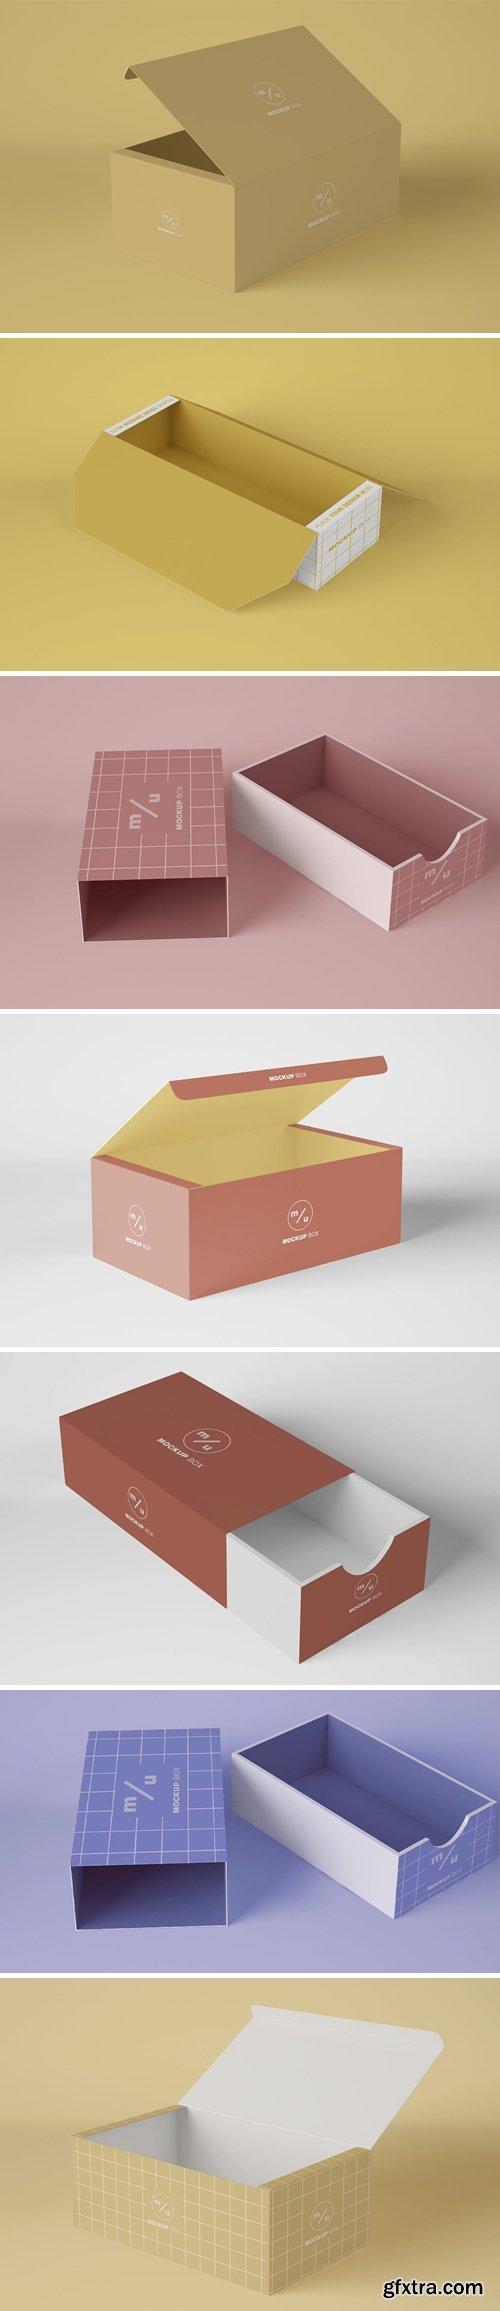 Opened Box Packaging Mockup